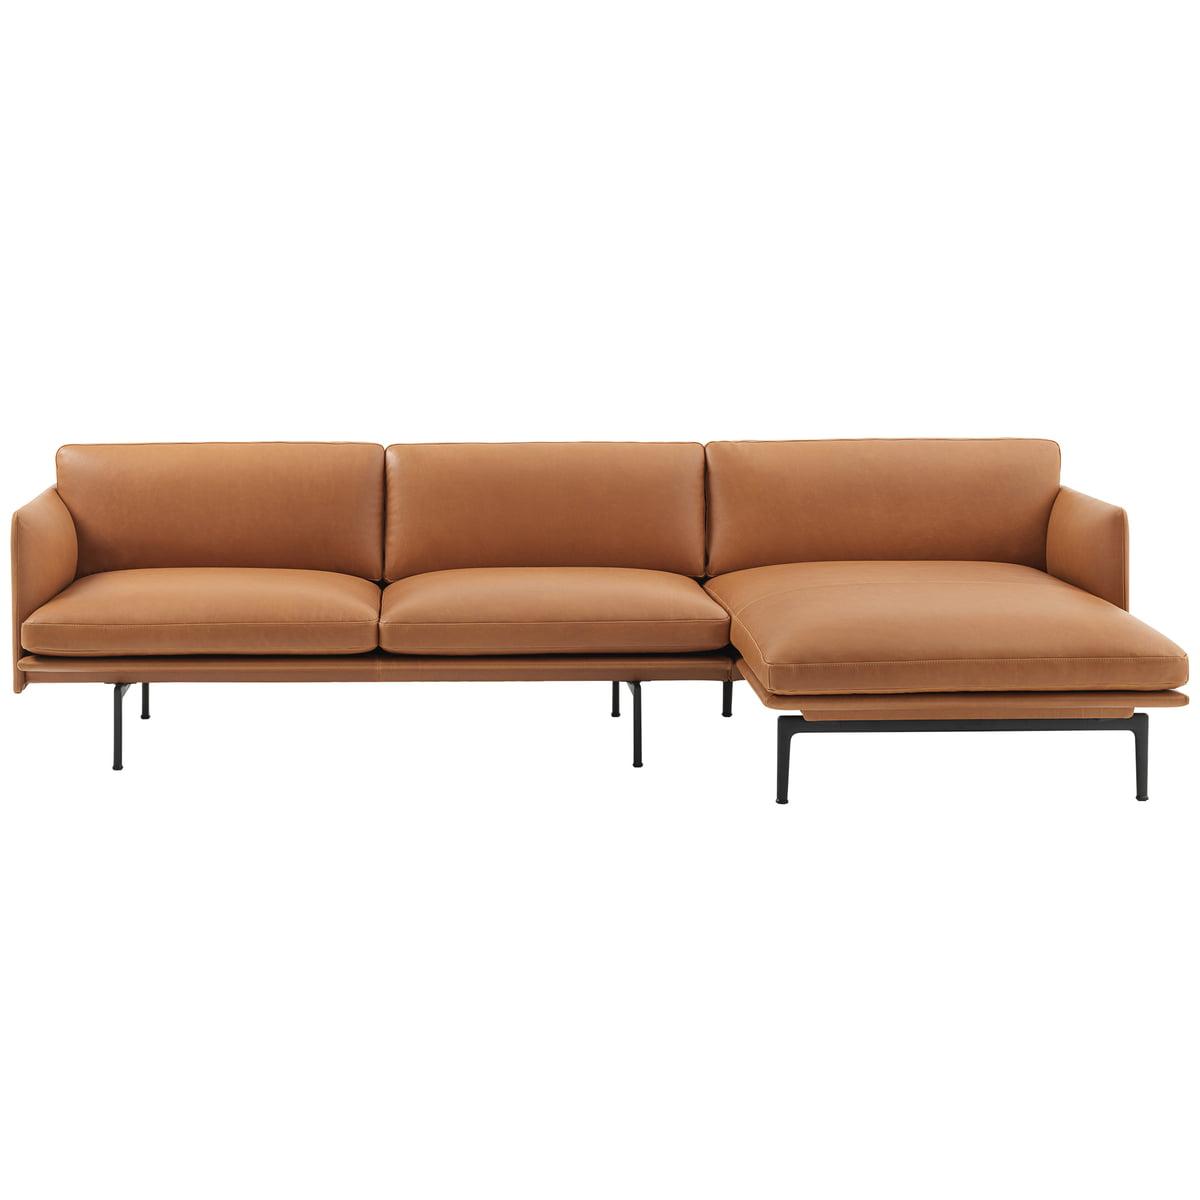 Ekstra Muuto – Outline sofa med chaiselong | Connox AK82